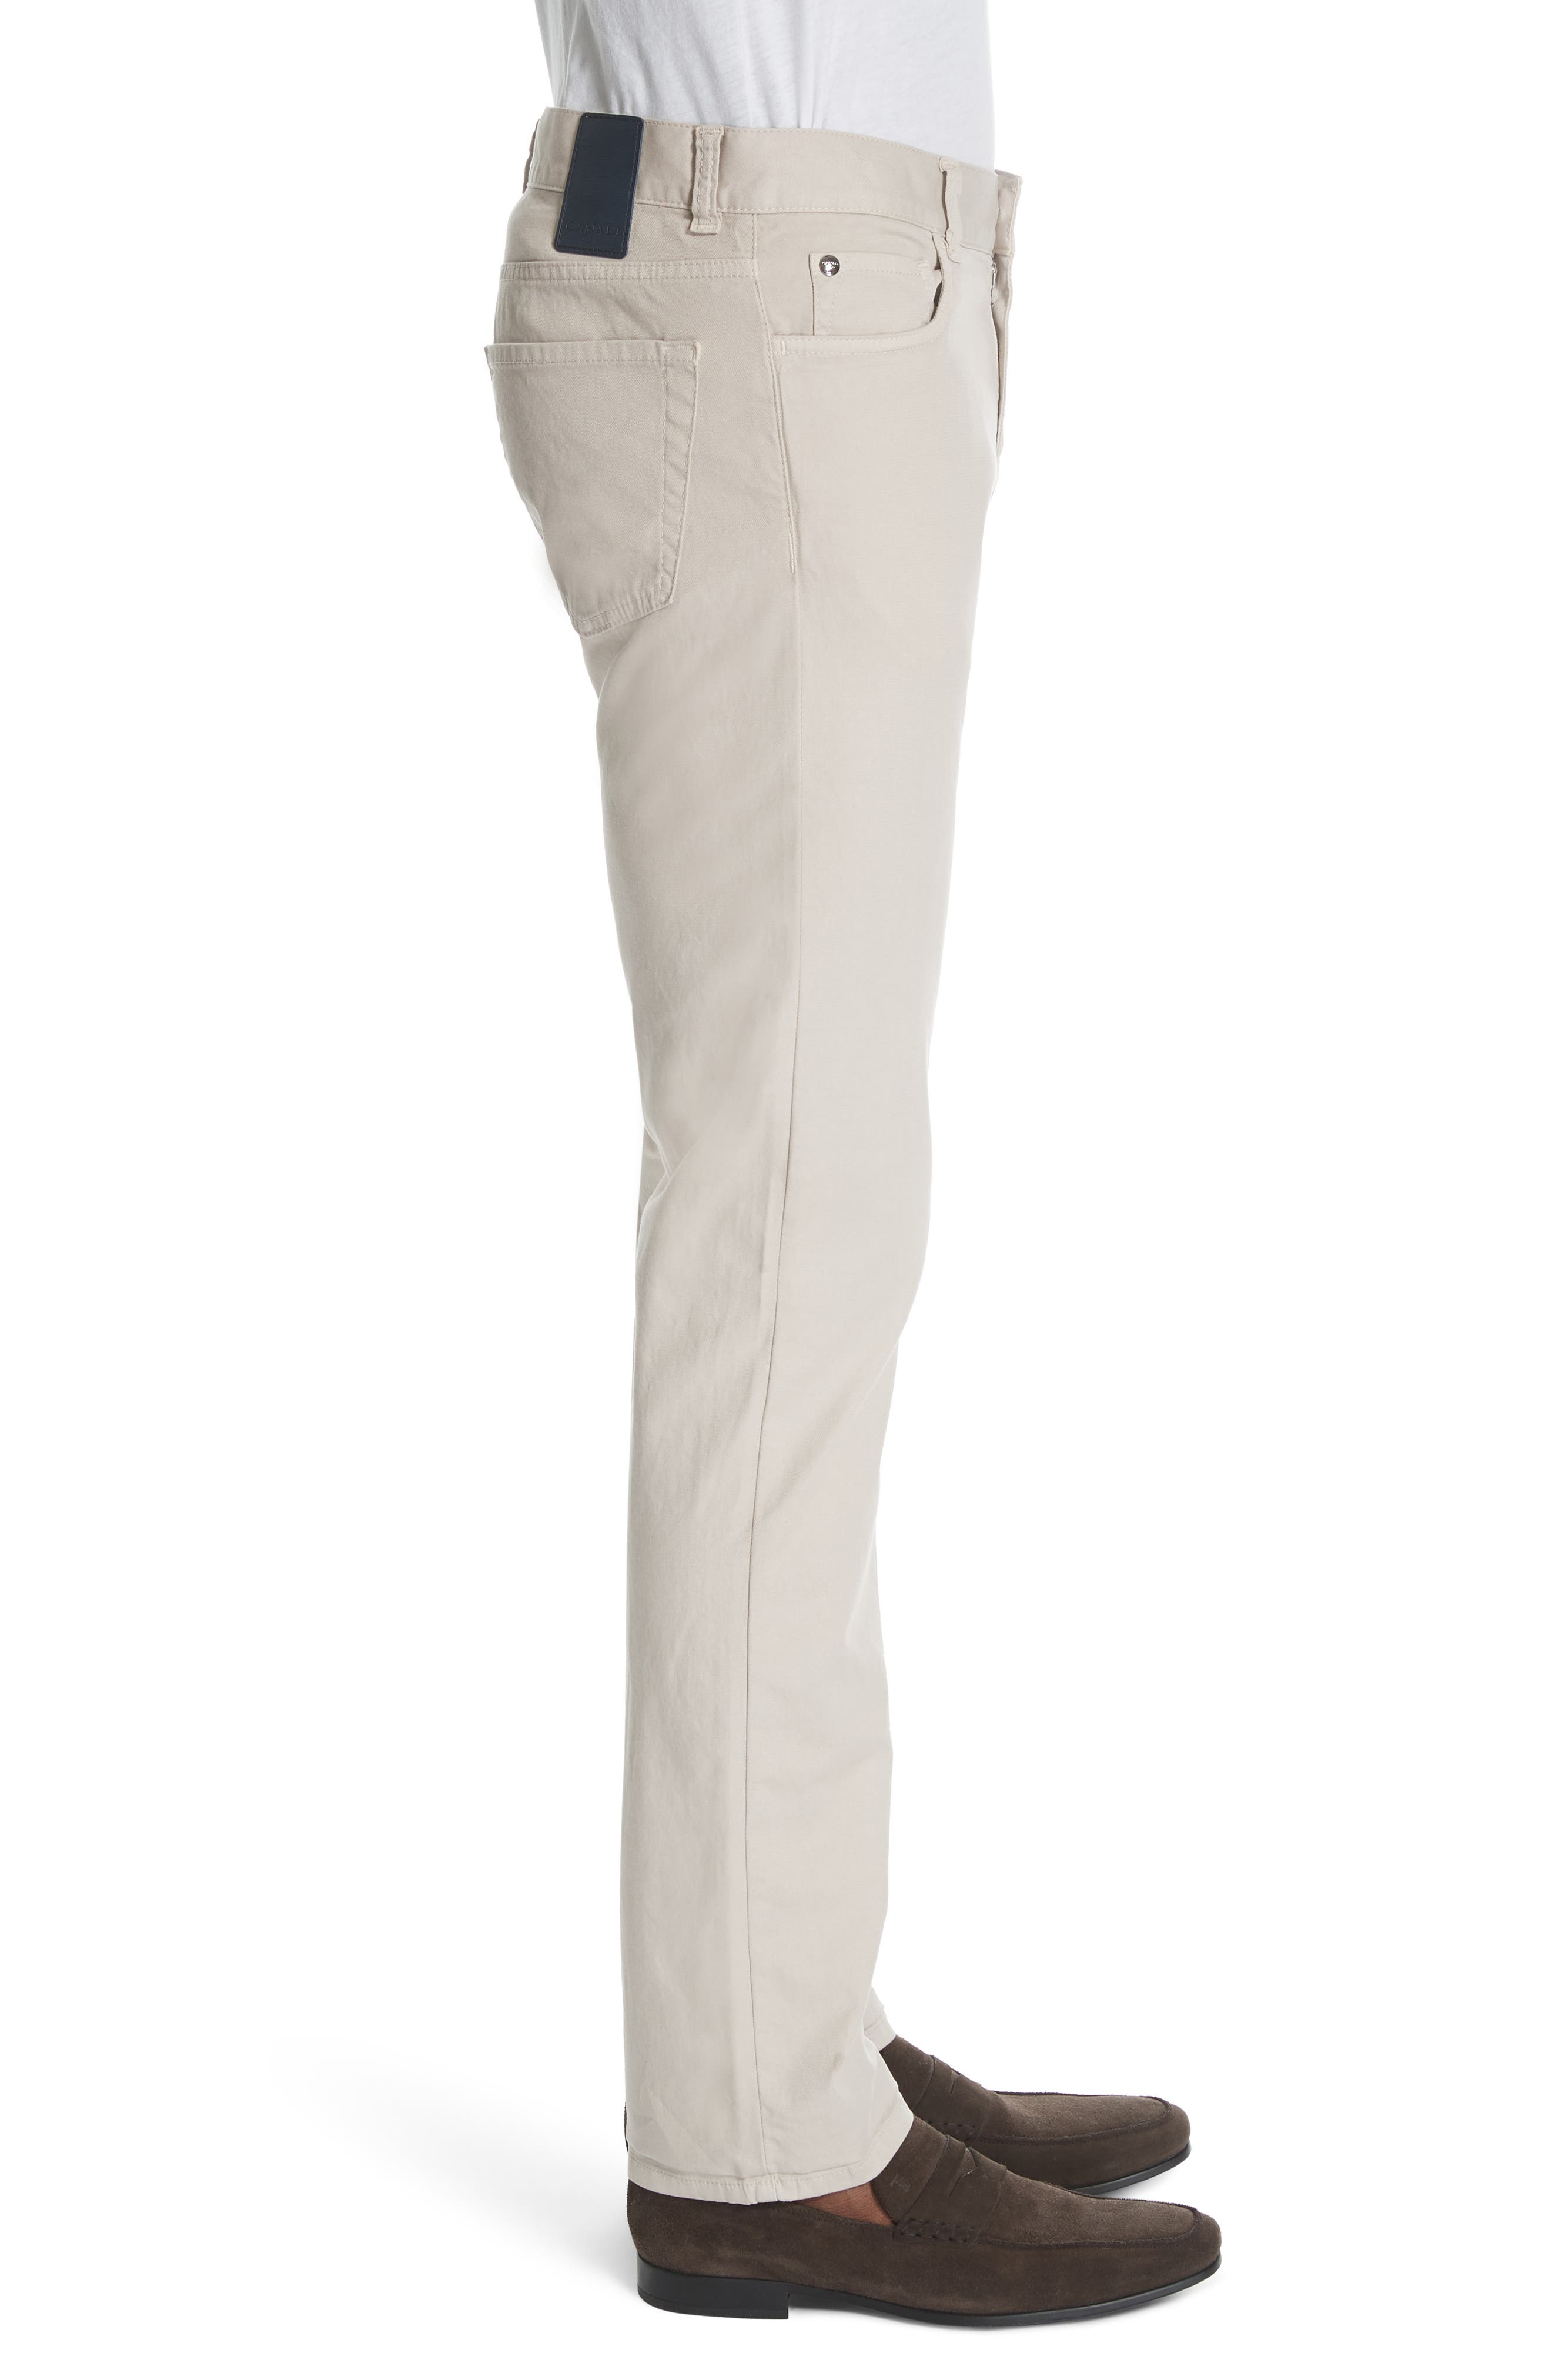 CANALI, Stretch Cotton Five Pocket Trousers, Alternate thumbnail 4, color, BEIGE